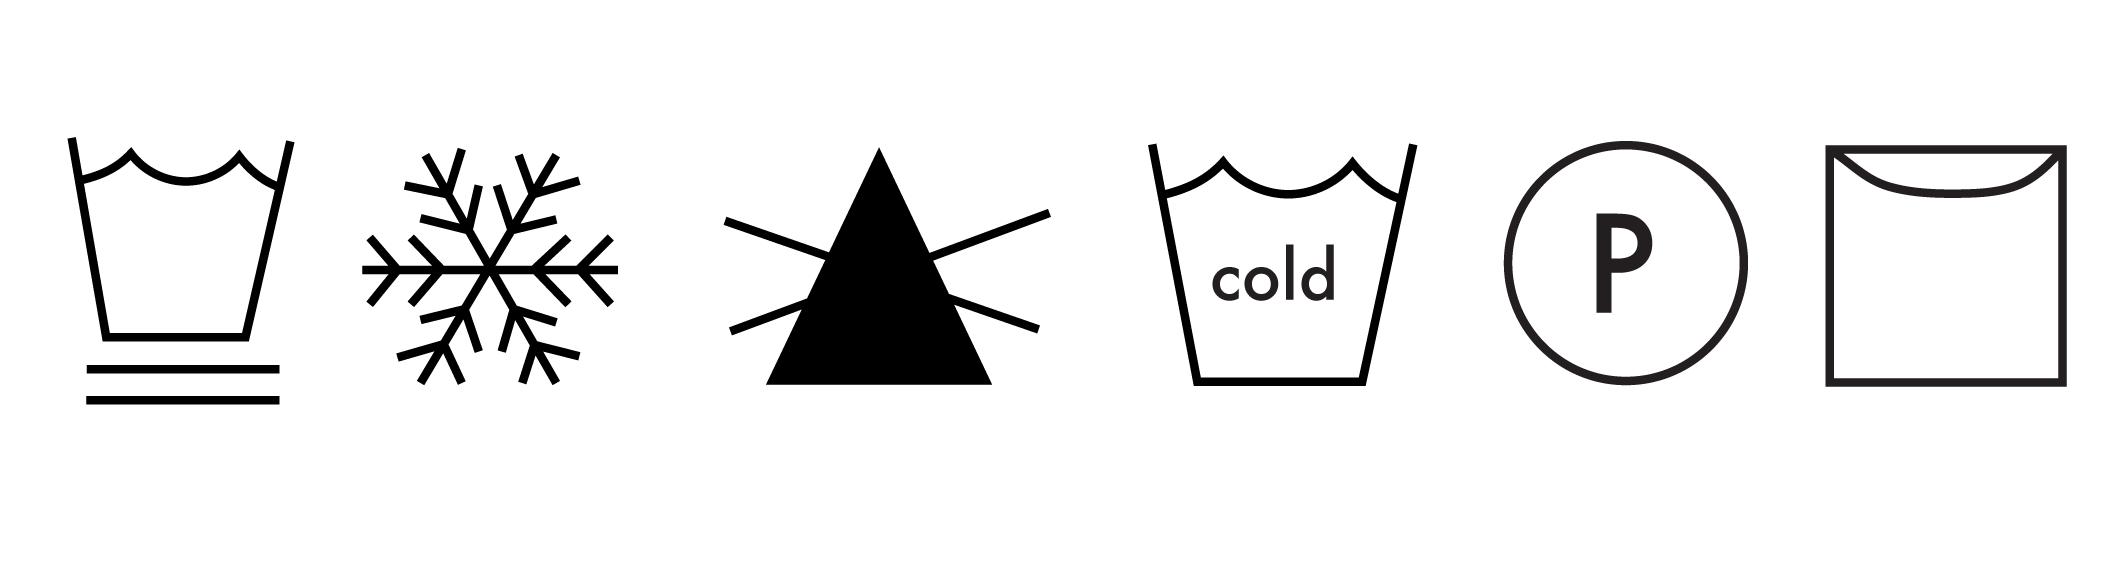 Washing-Symbols.png